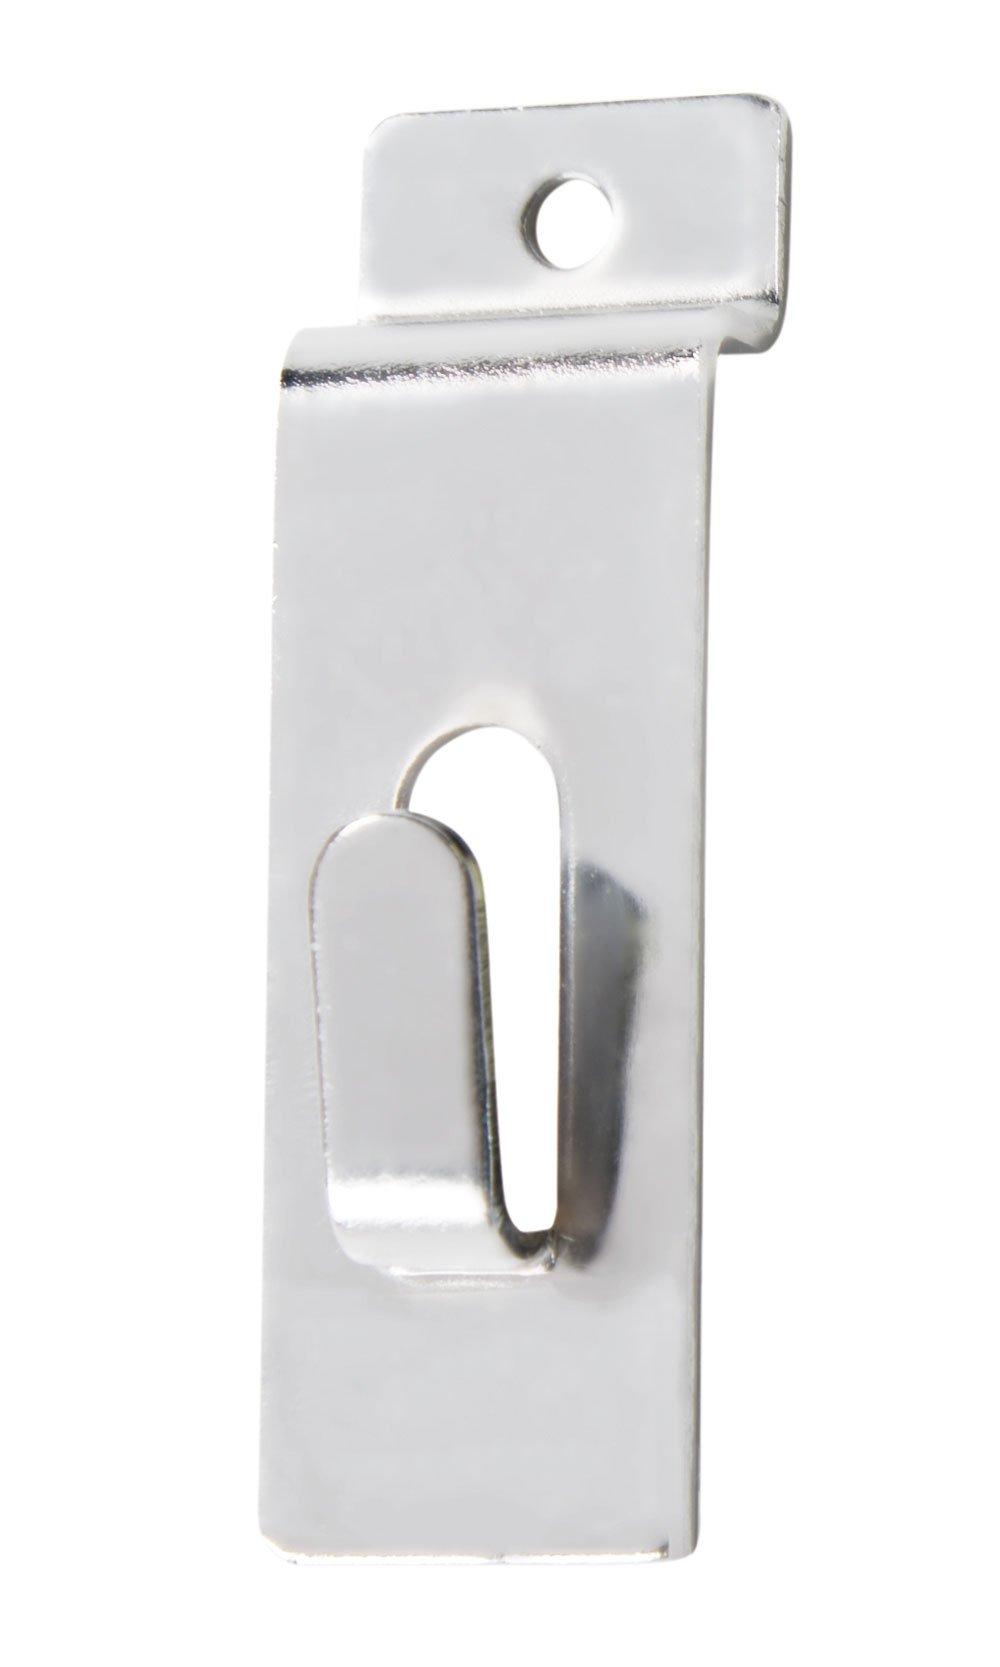 Chrome Notch Hook for Slatwall - Pack of 25